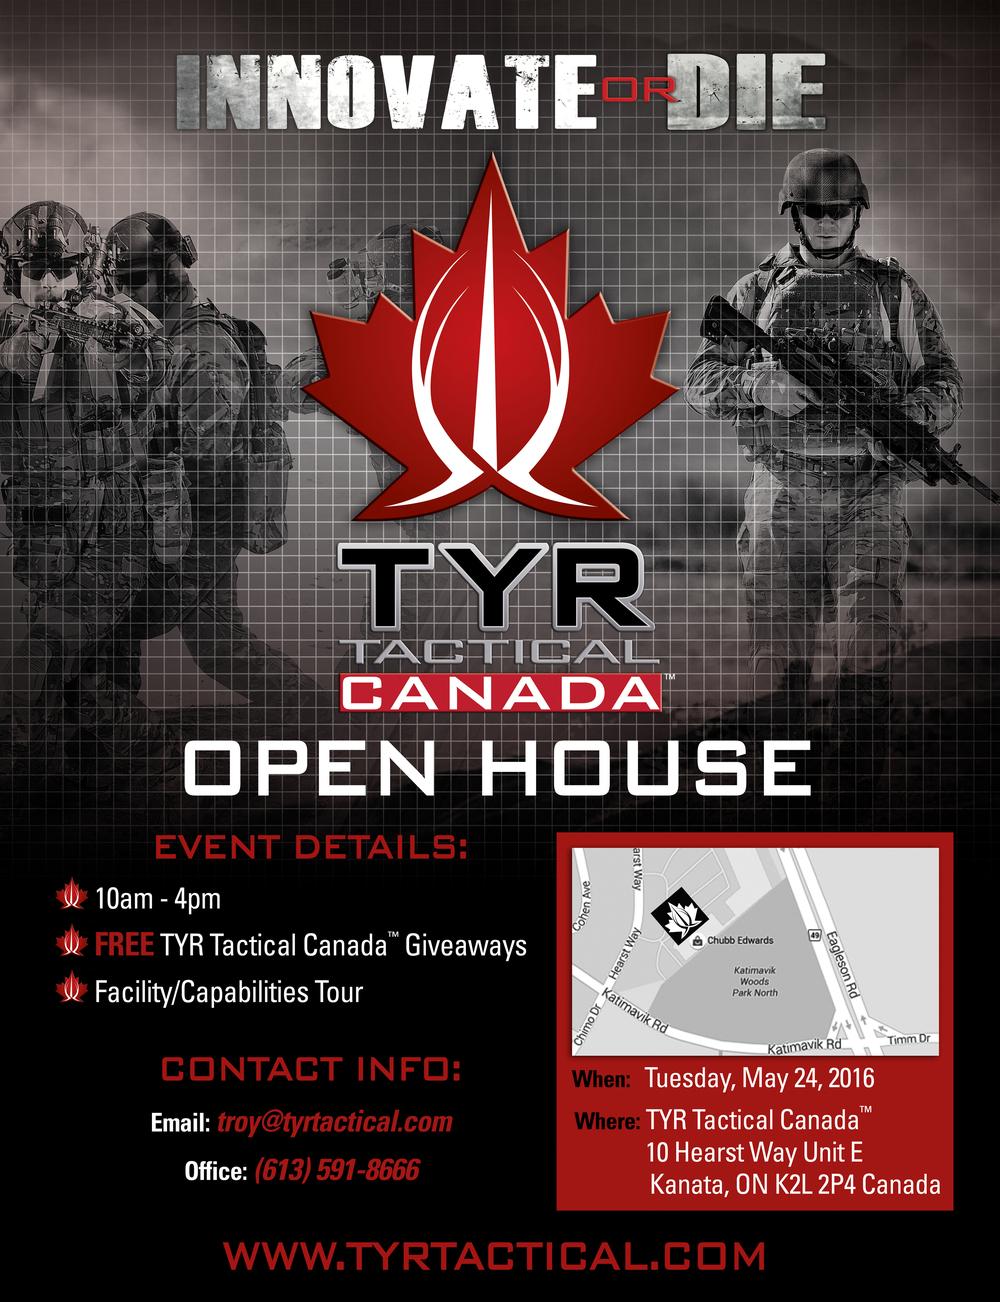 TYR2015_TYR_CANADA_Invite_1.jpg